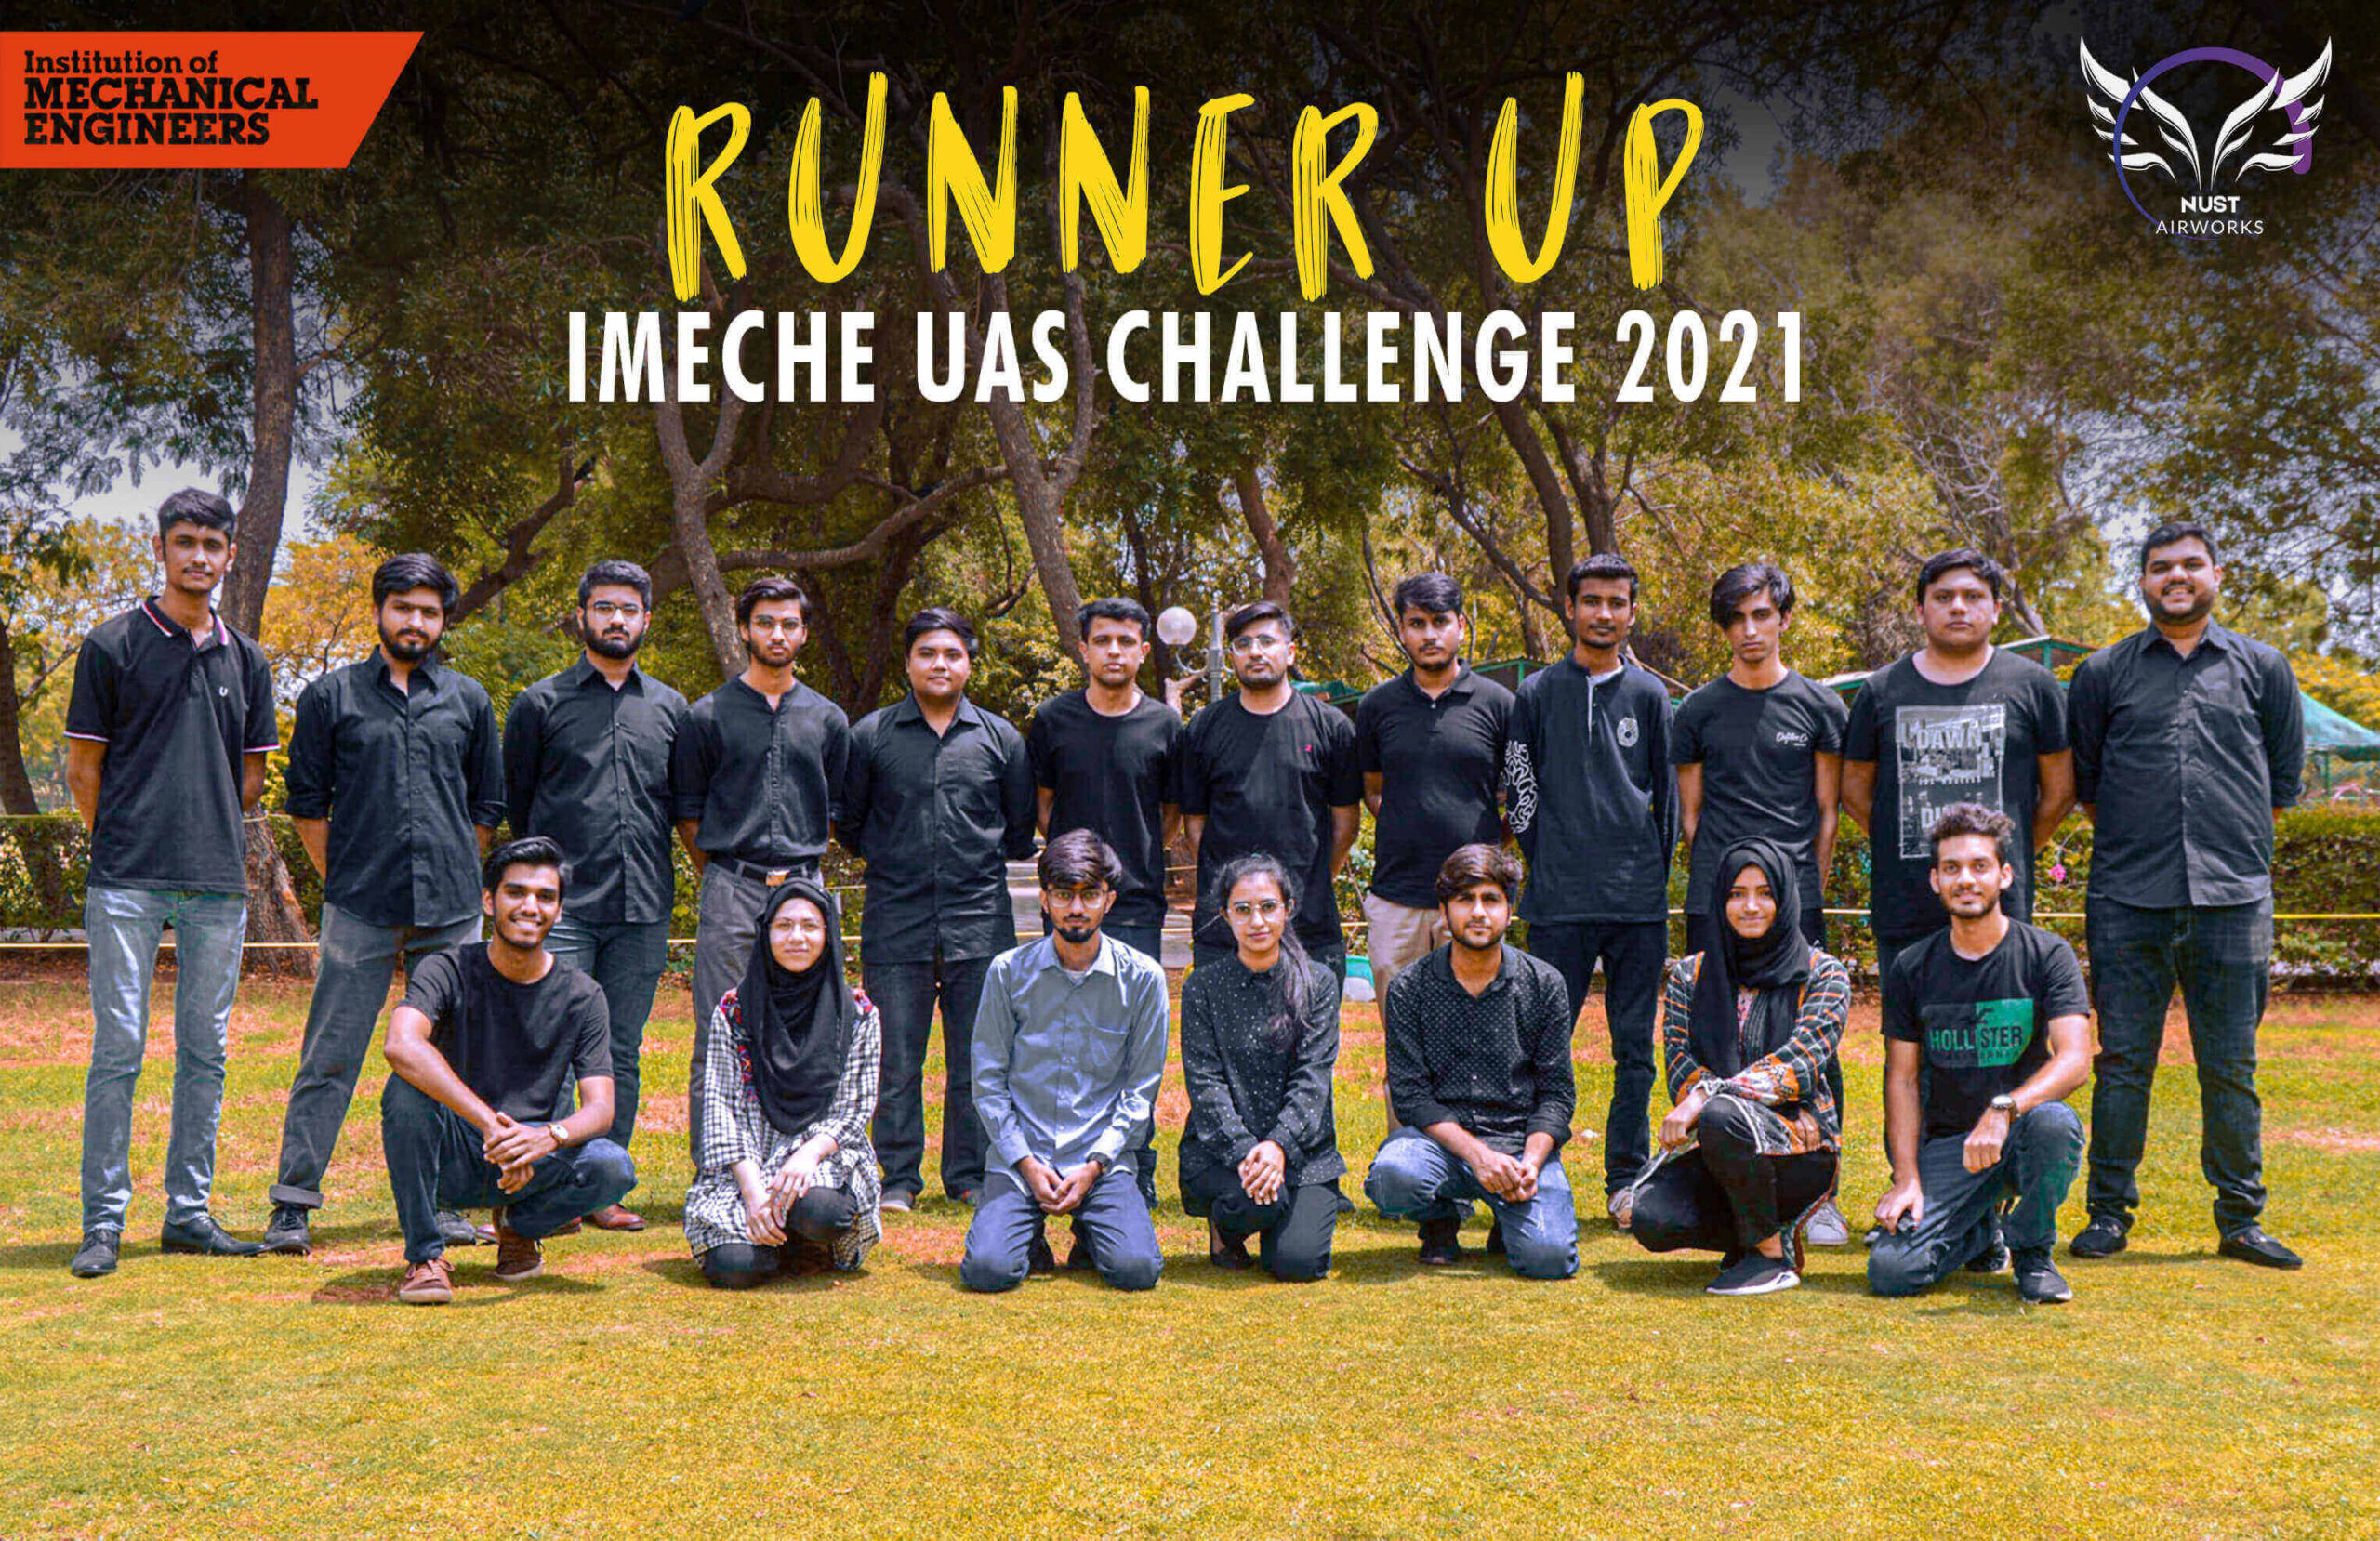 'Team NUST Airworks' wins the Runner Up Award at U.K's IMechE UAS Challenge 2021